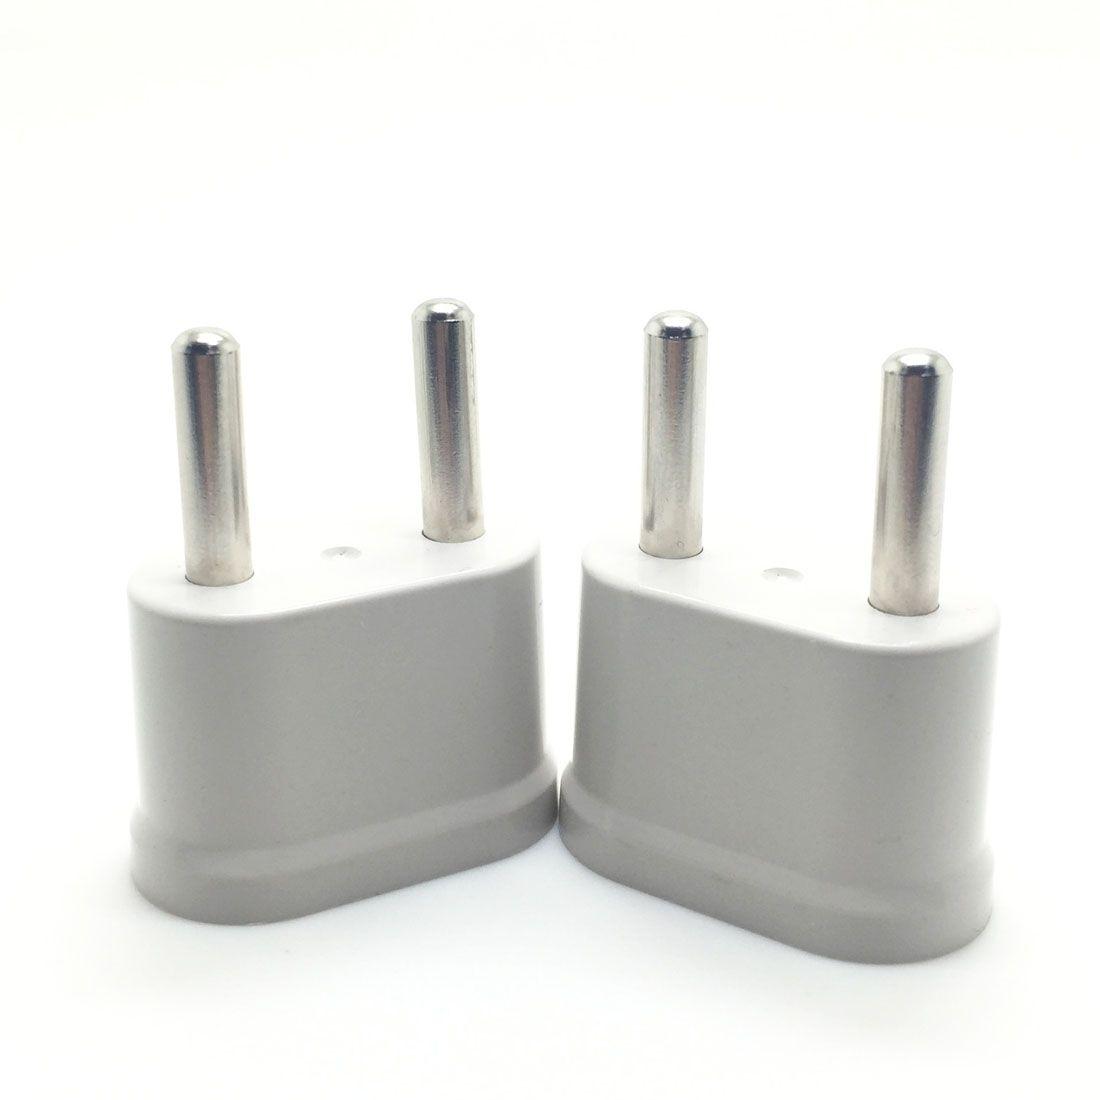 MAIF Good Sale 2pcs US USA to EU EURO Europe Travel Power Plug Adapter  Charger Converter for USA converter White